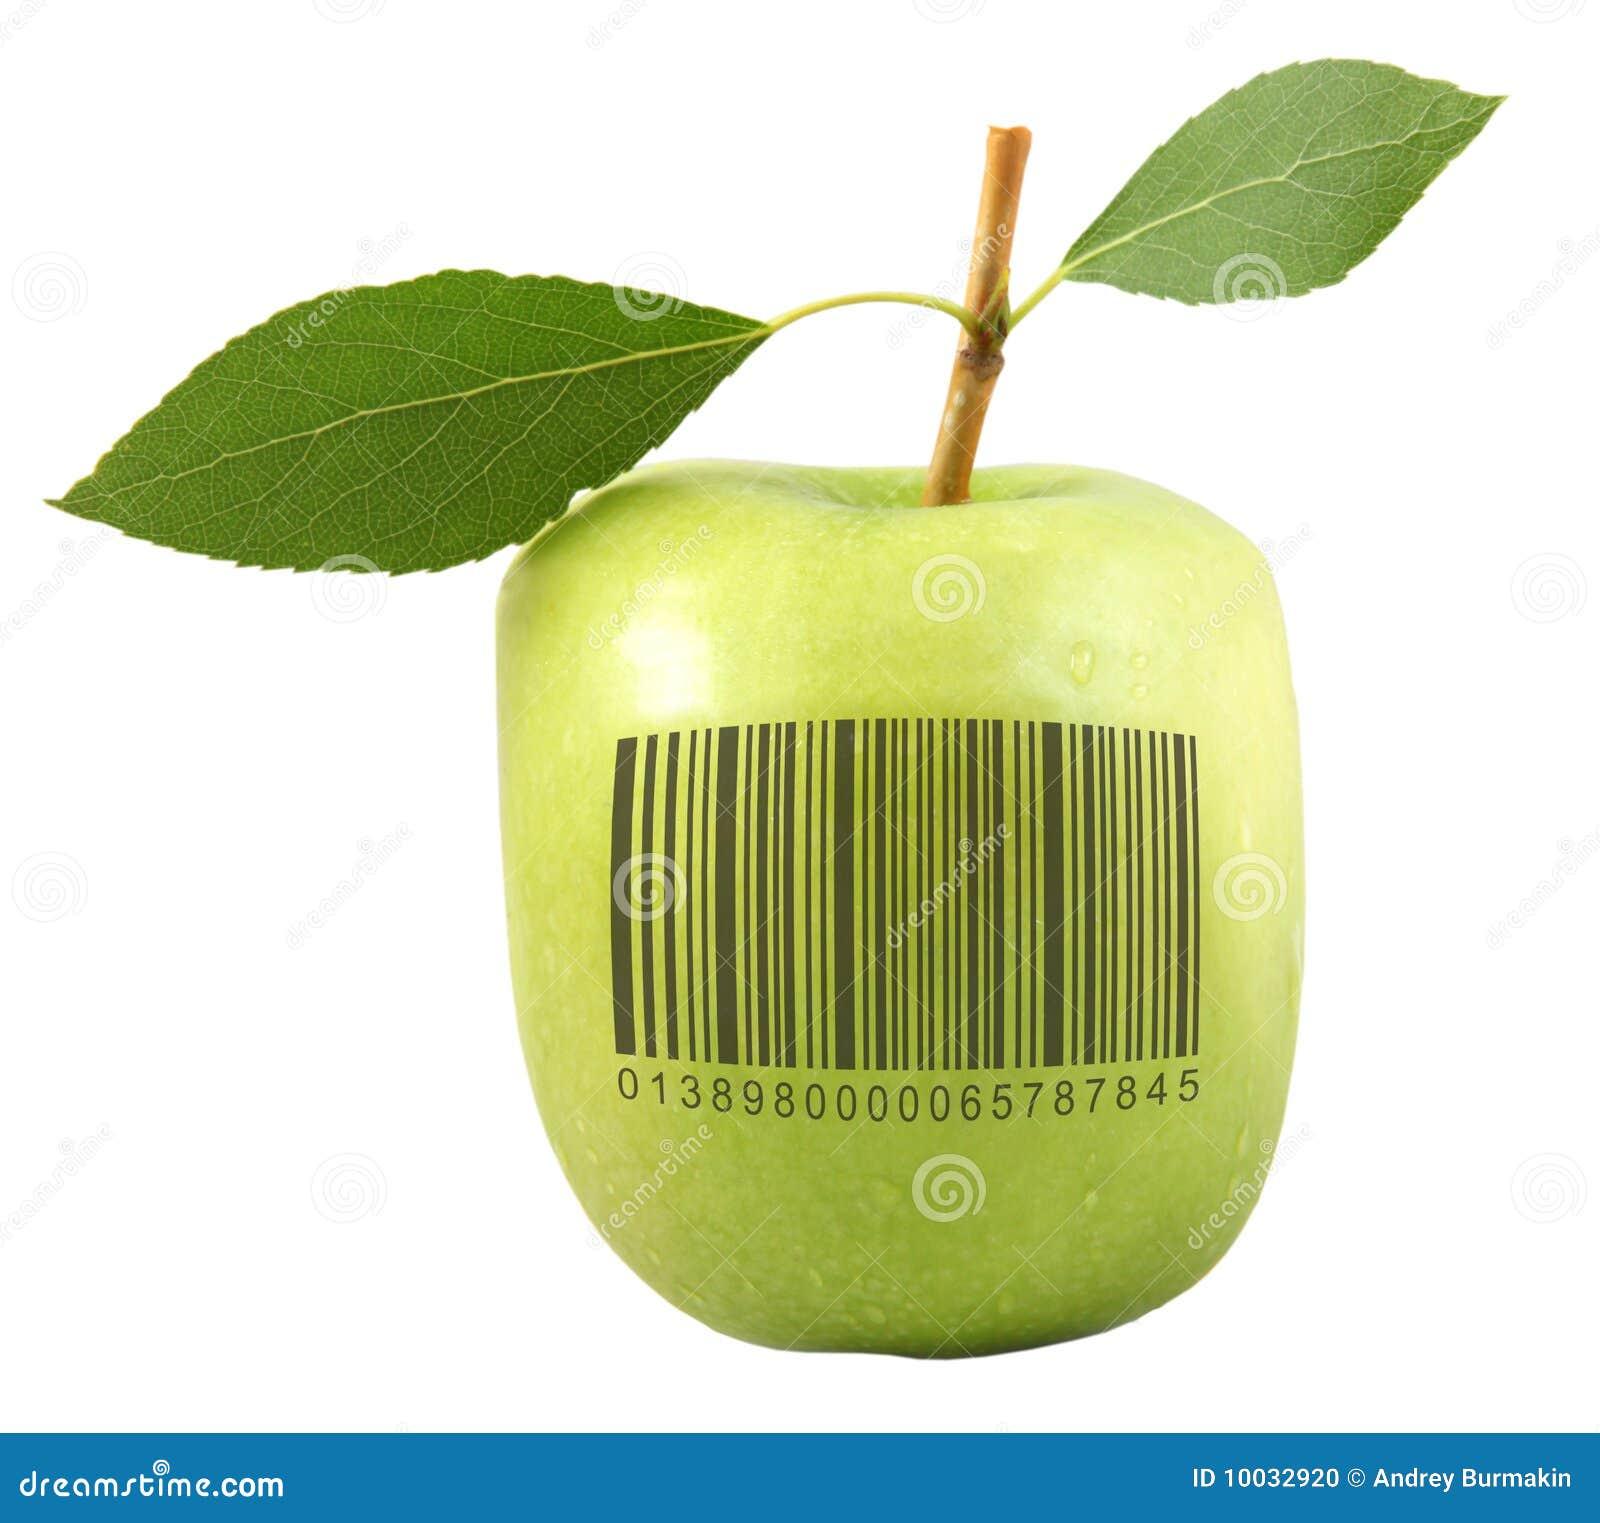 GO IN-DEPTH ON Apple STOCK